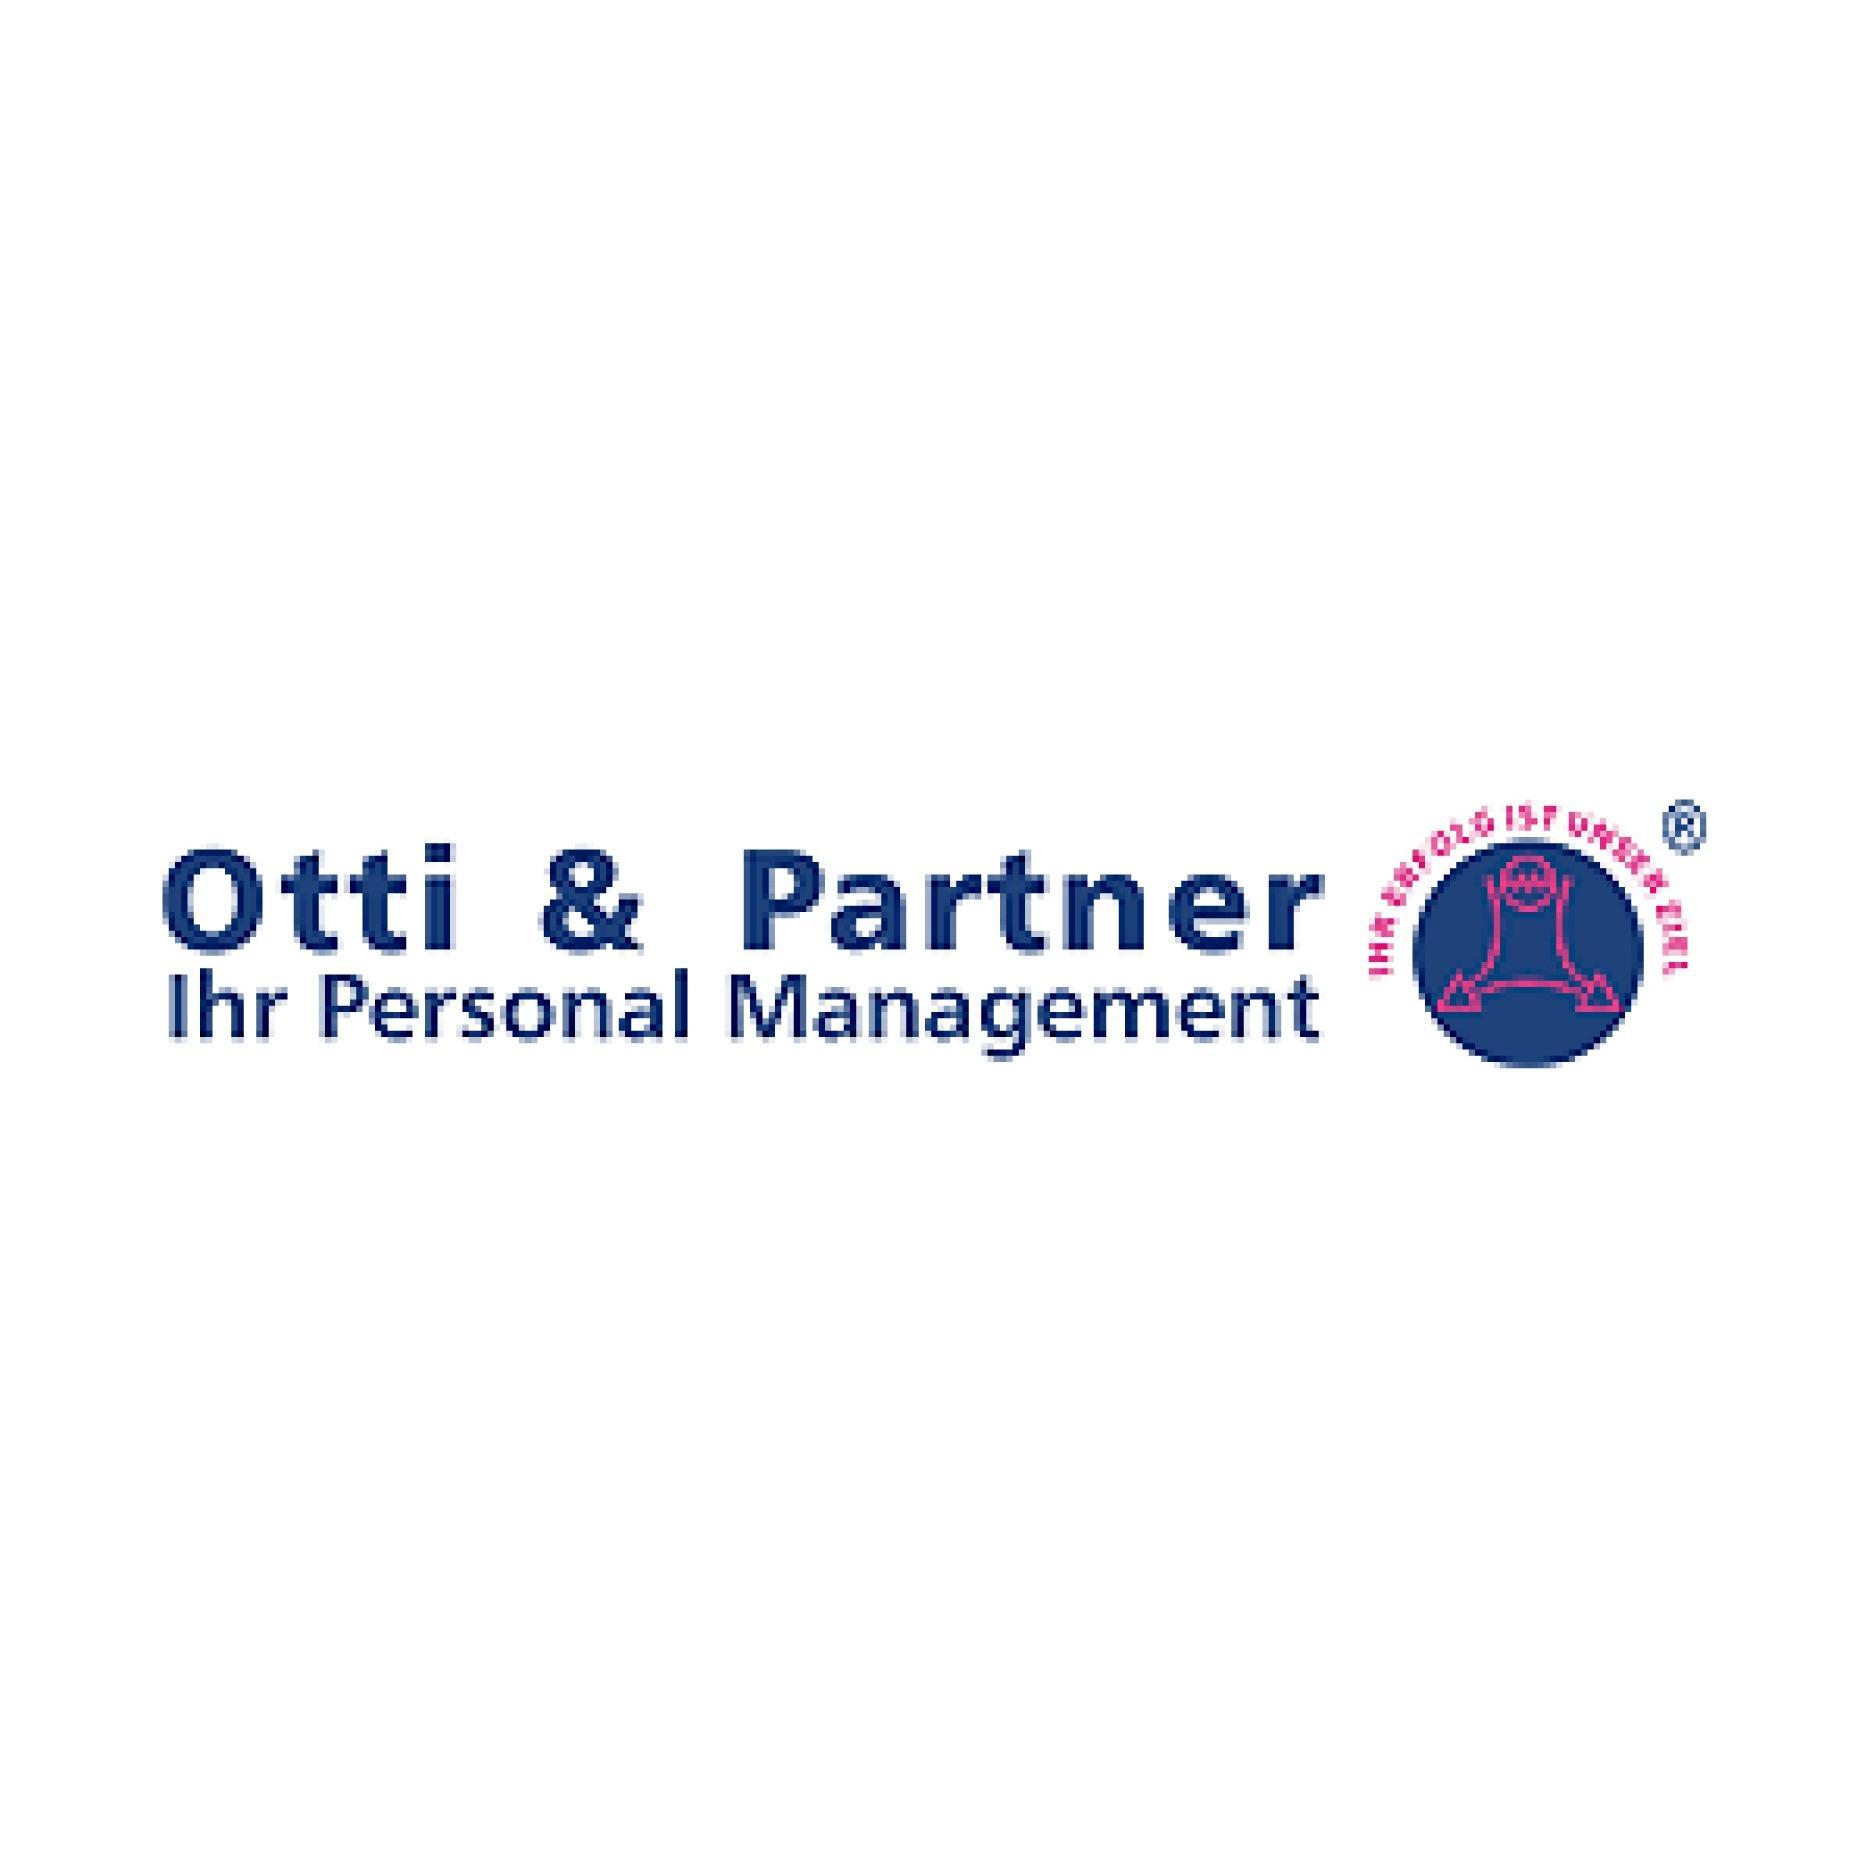 Otti & Partner